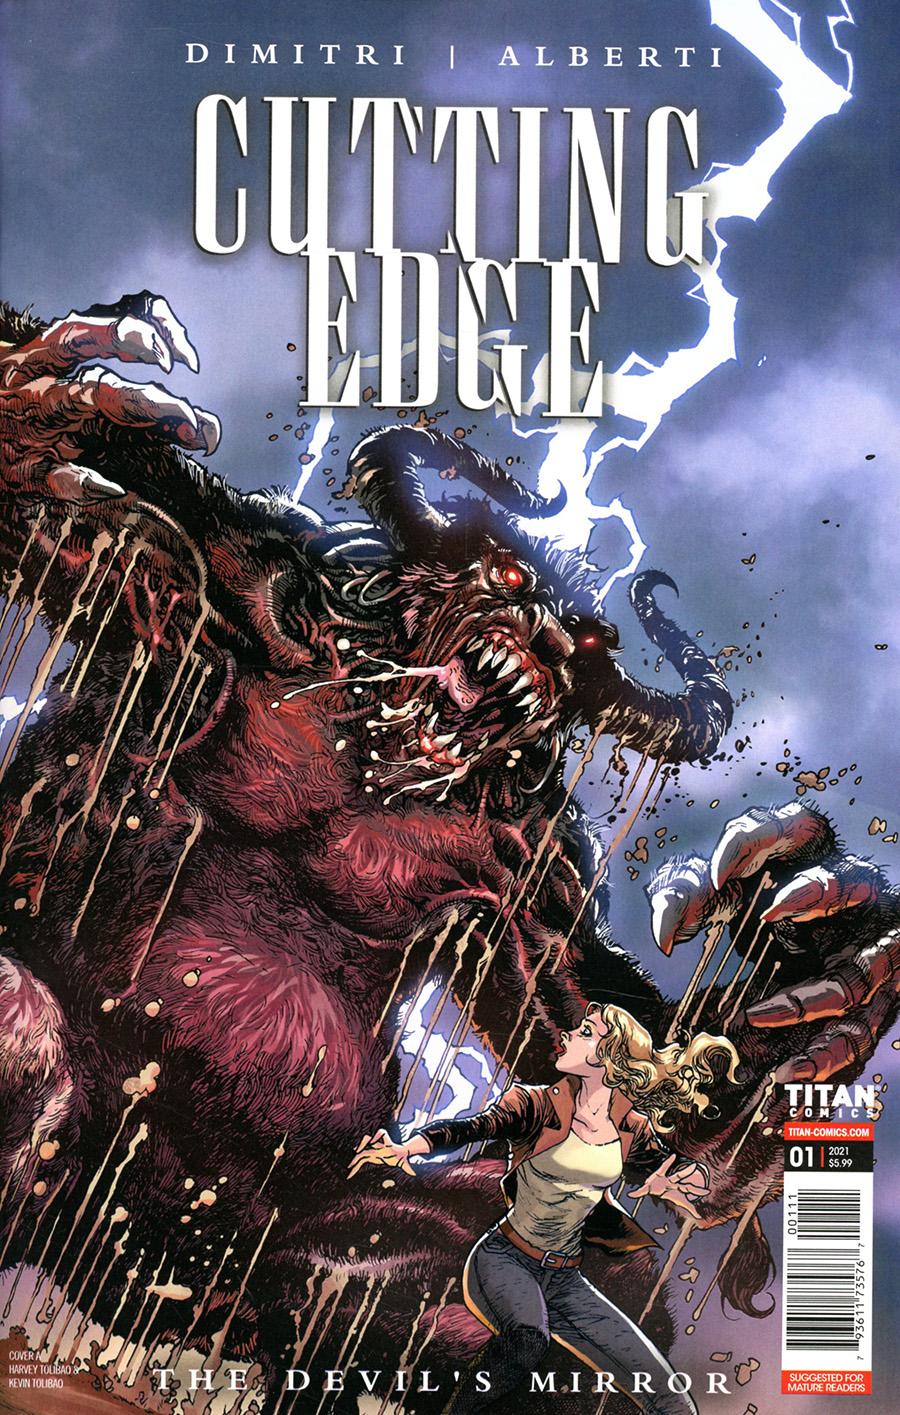 Cutting Edge Devils Mirror #1 Cover A Regular Harvey Tolibao Cover